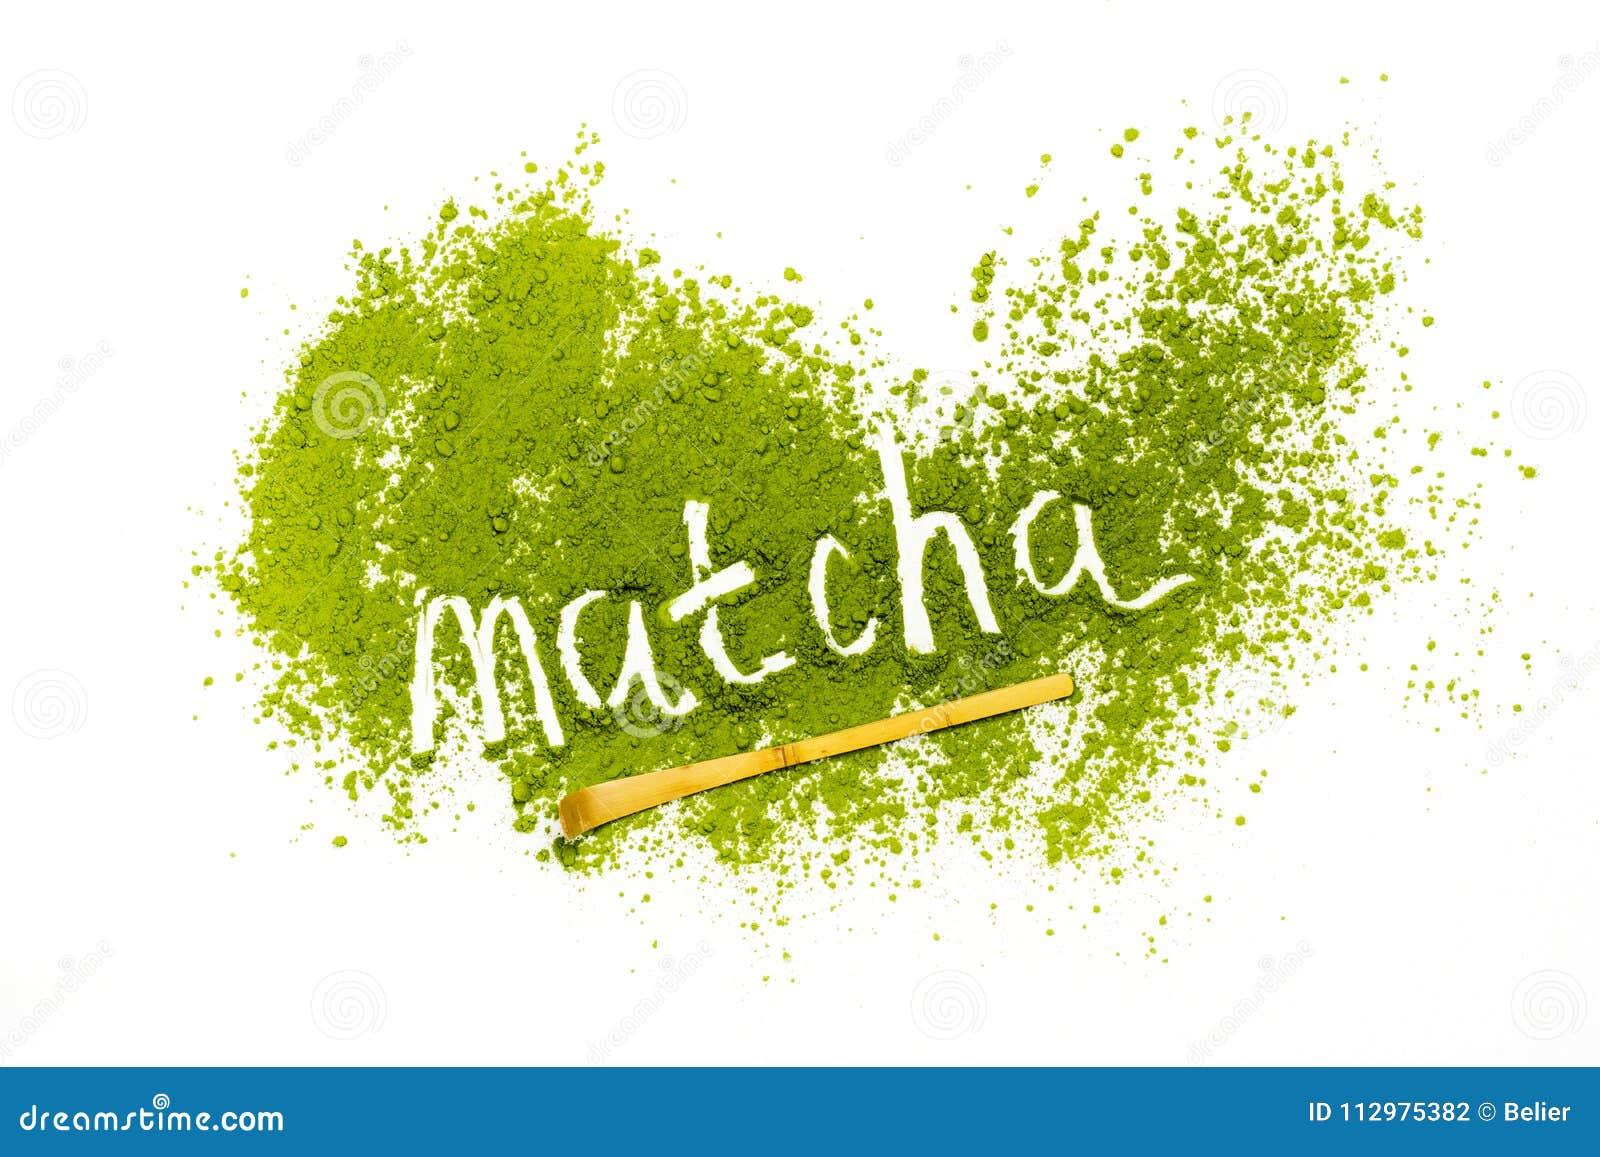 Word matcha made of powdered matcha green tea